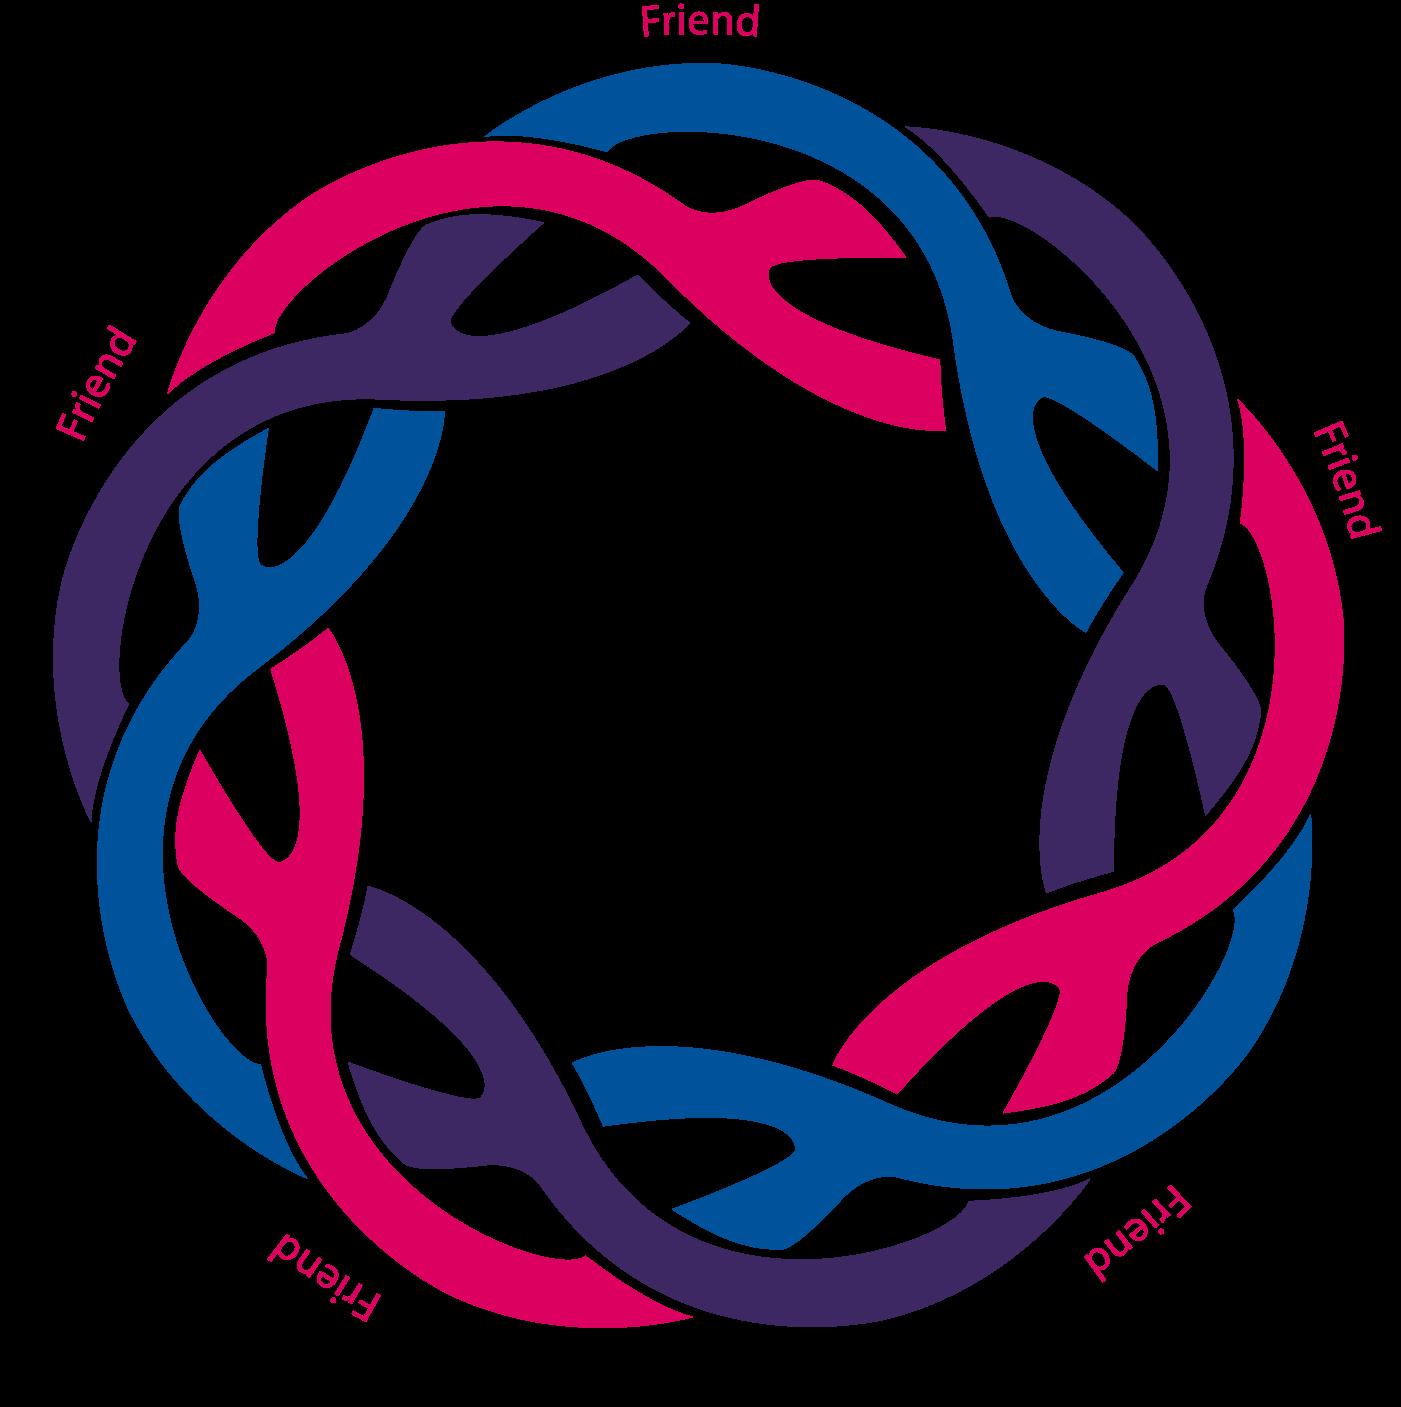 Friendship project logo